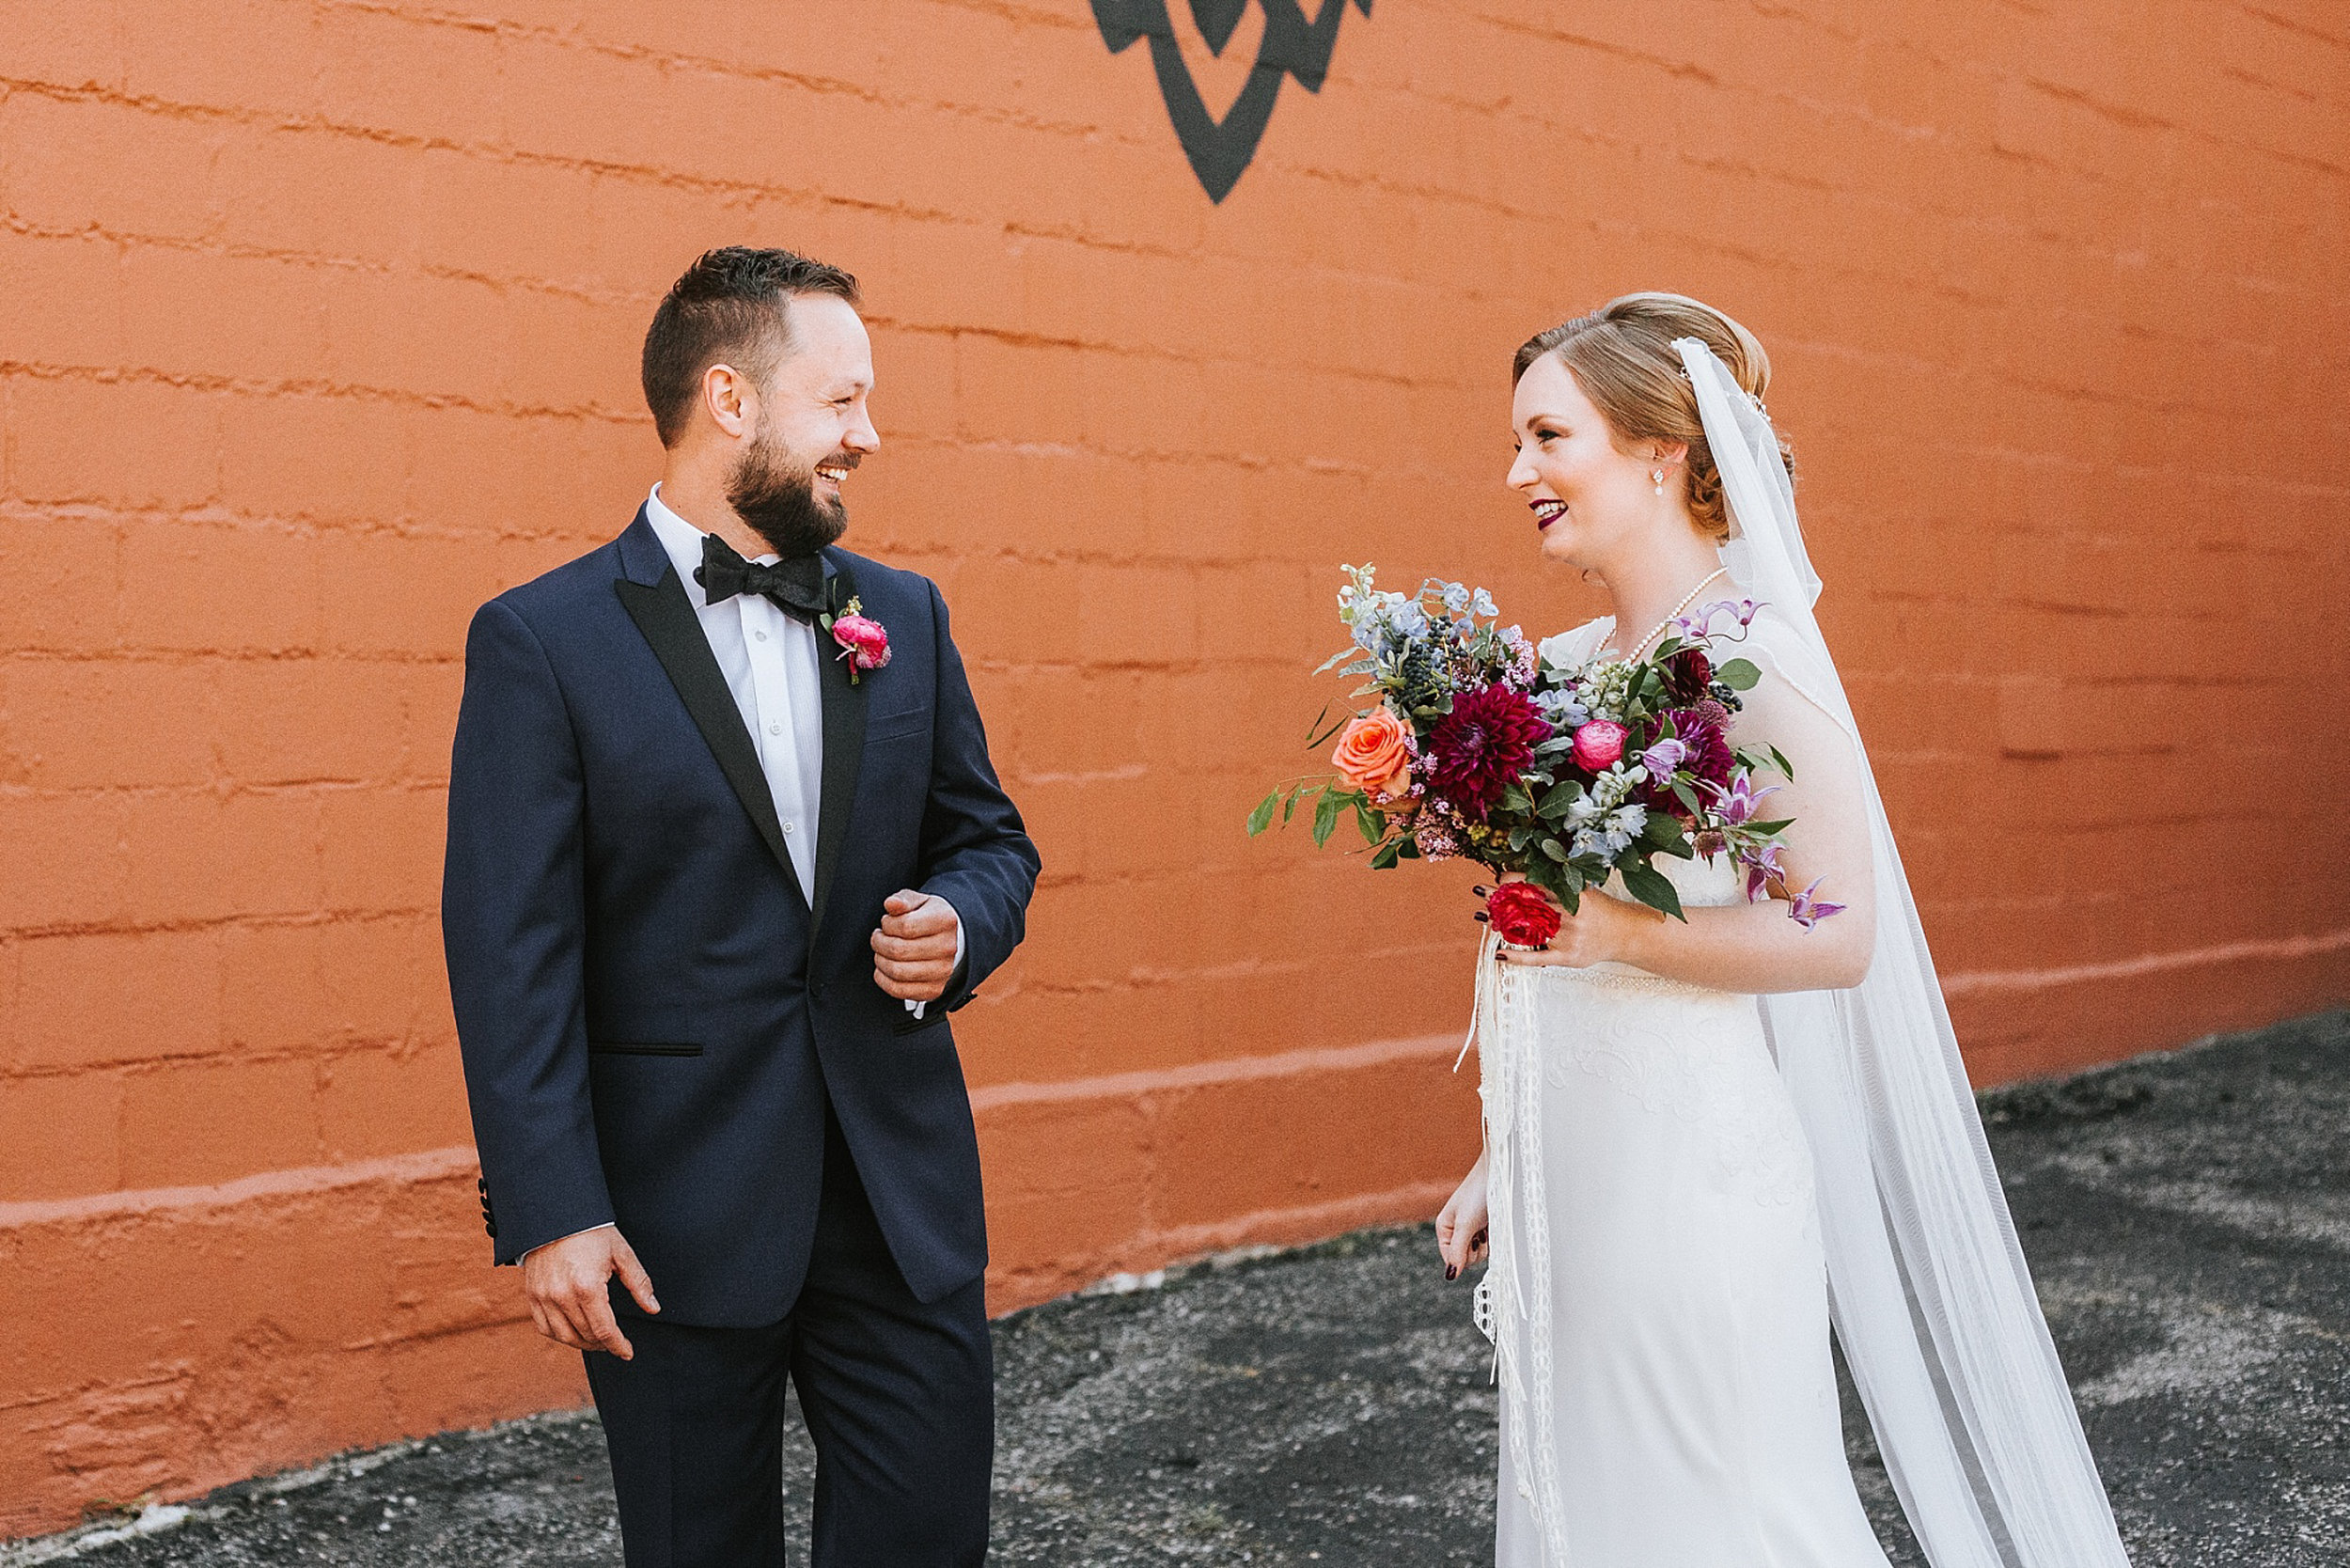 Brooke Townsend Photography - Ohio Wedding Photographer-37.jpg